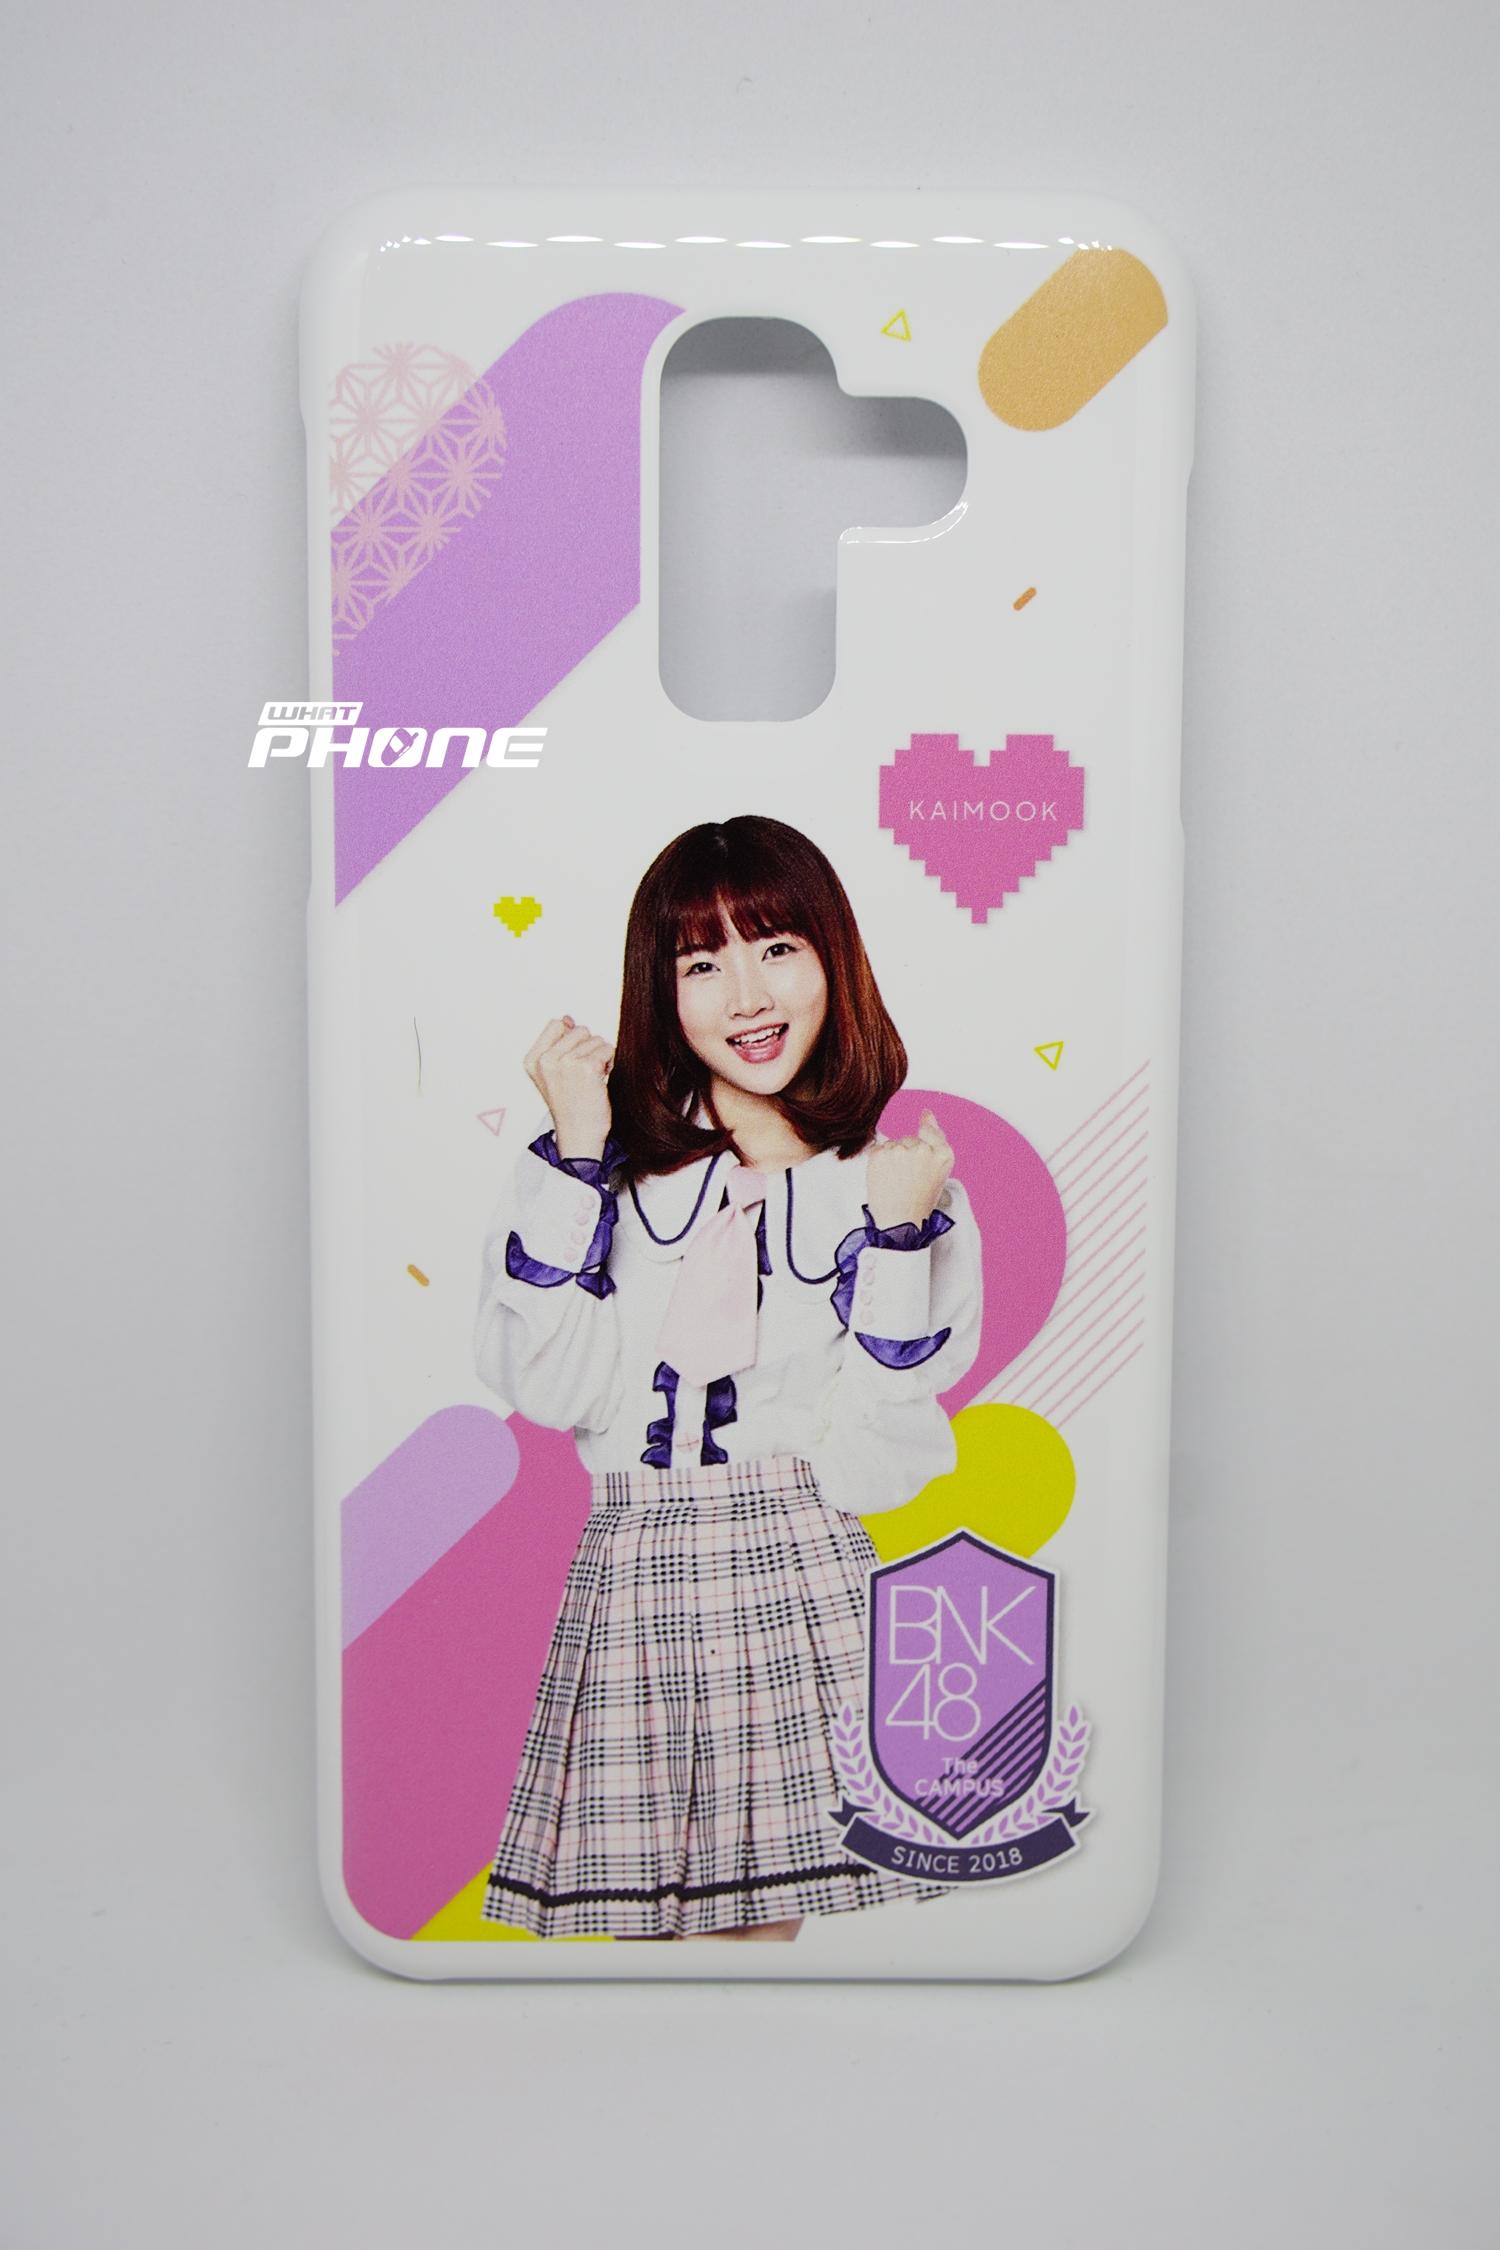 Samsung Galaxy J8 x BNK48 Limited Edition BOXSET Unboxing (10)